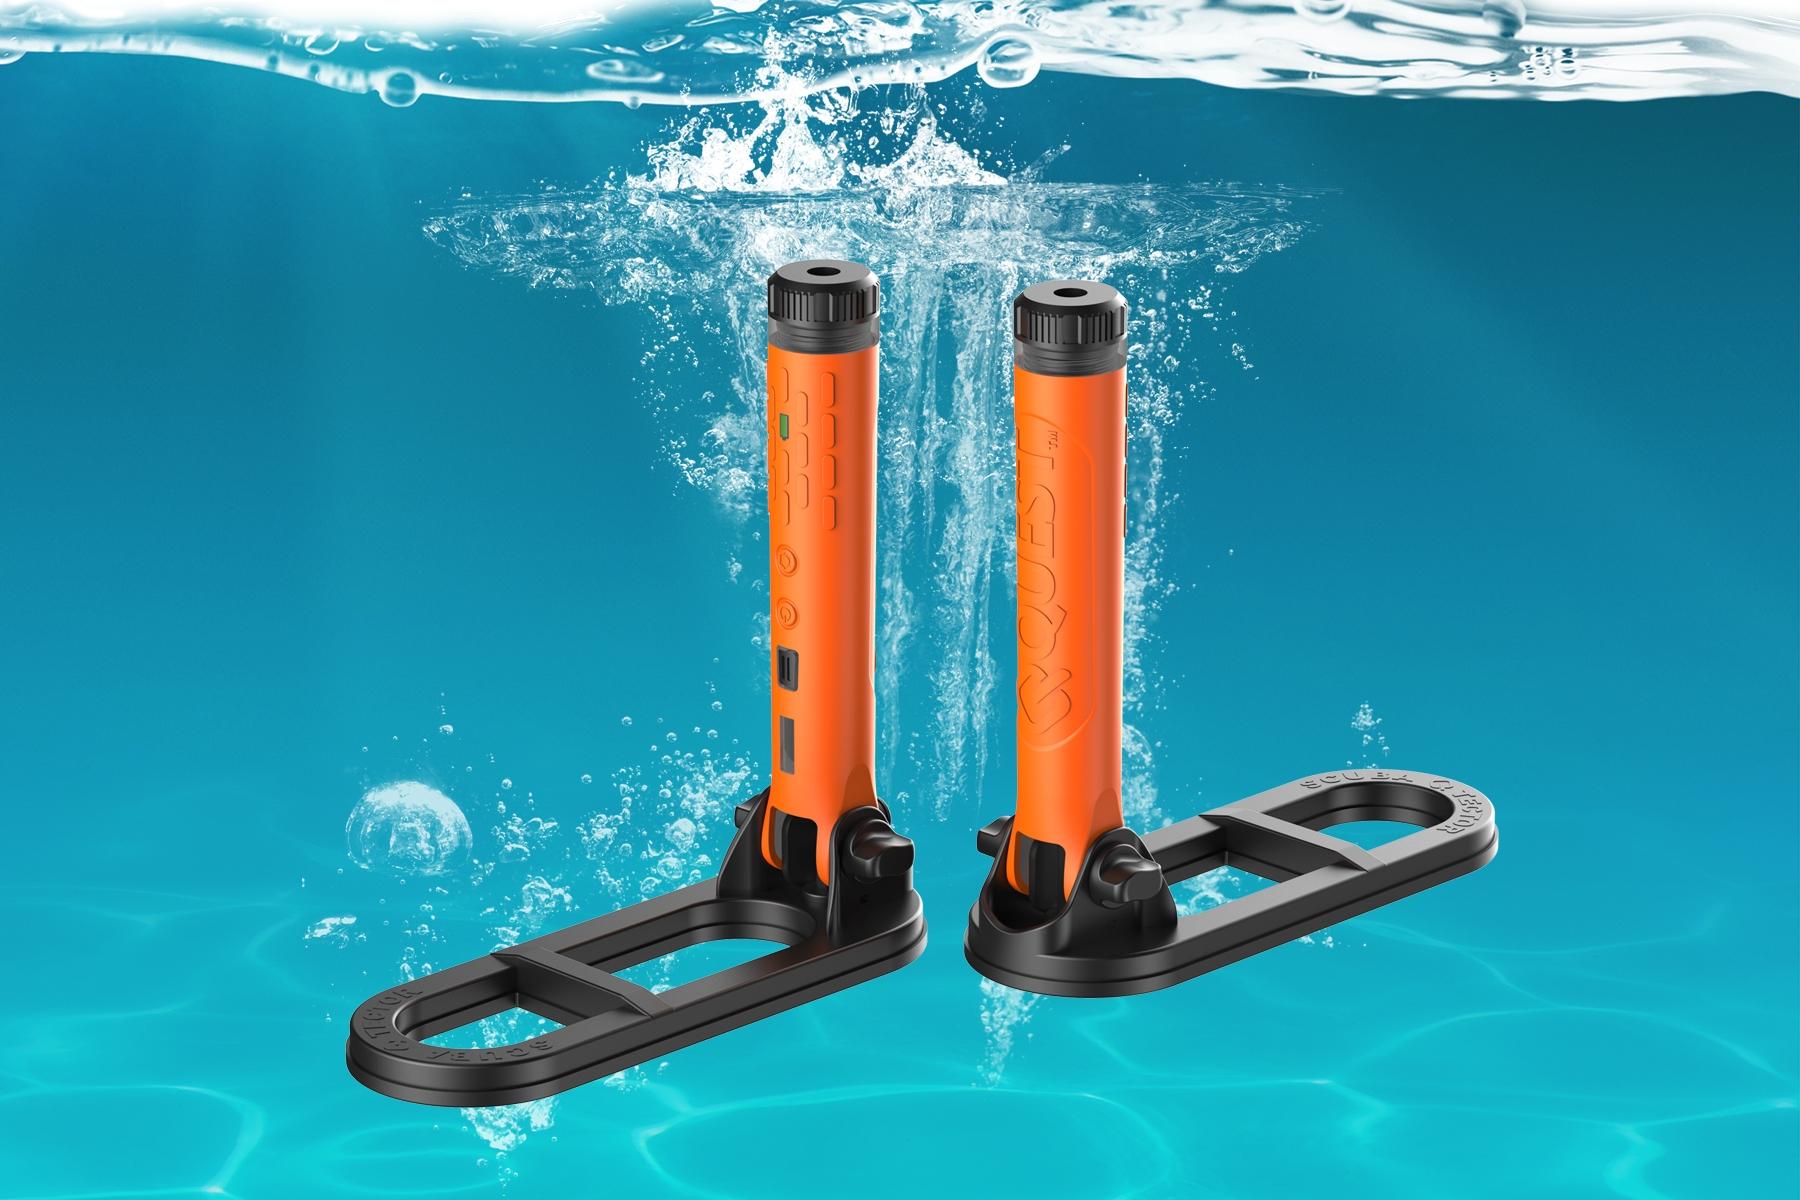 Detector submarino de mano